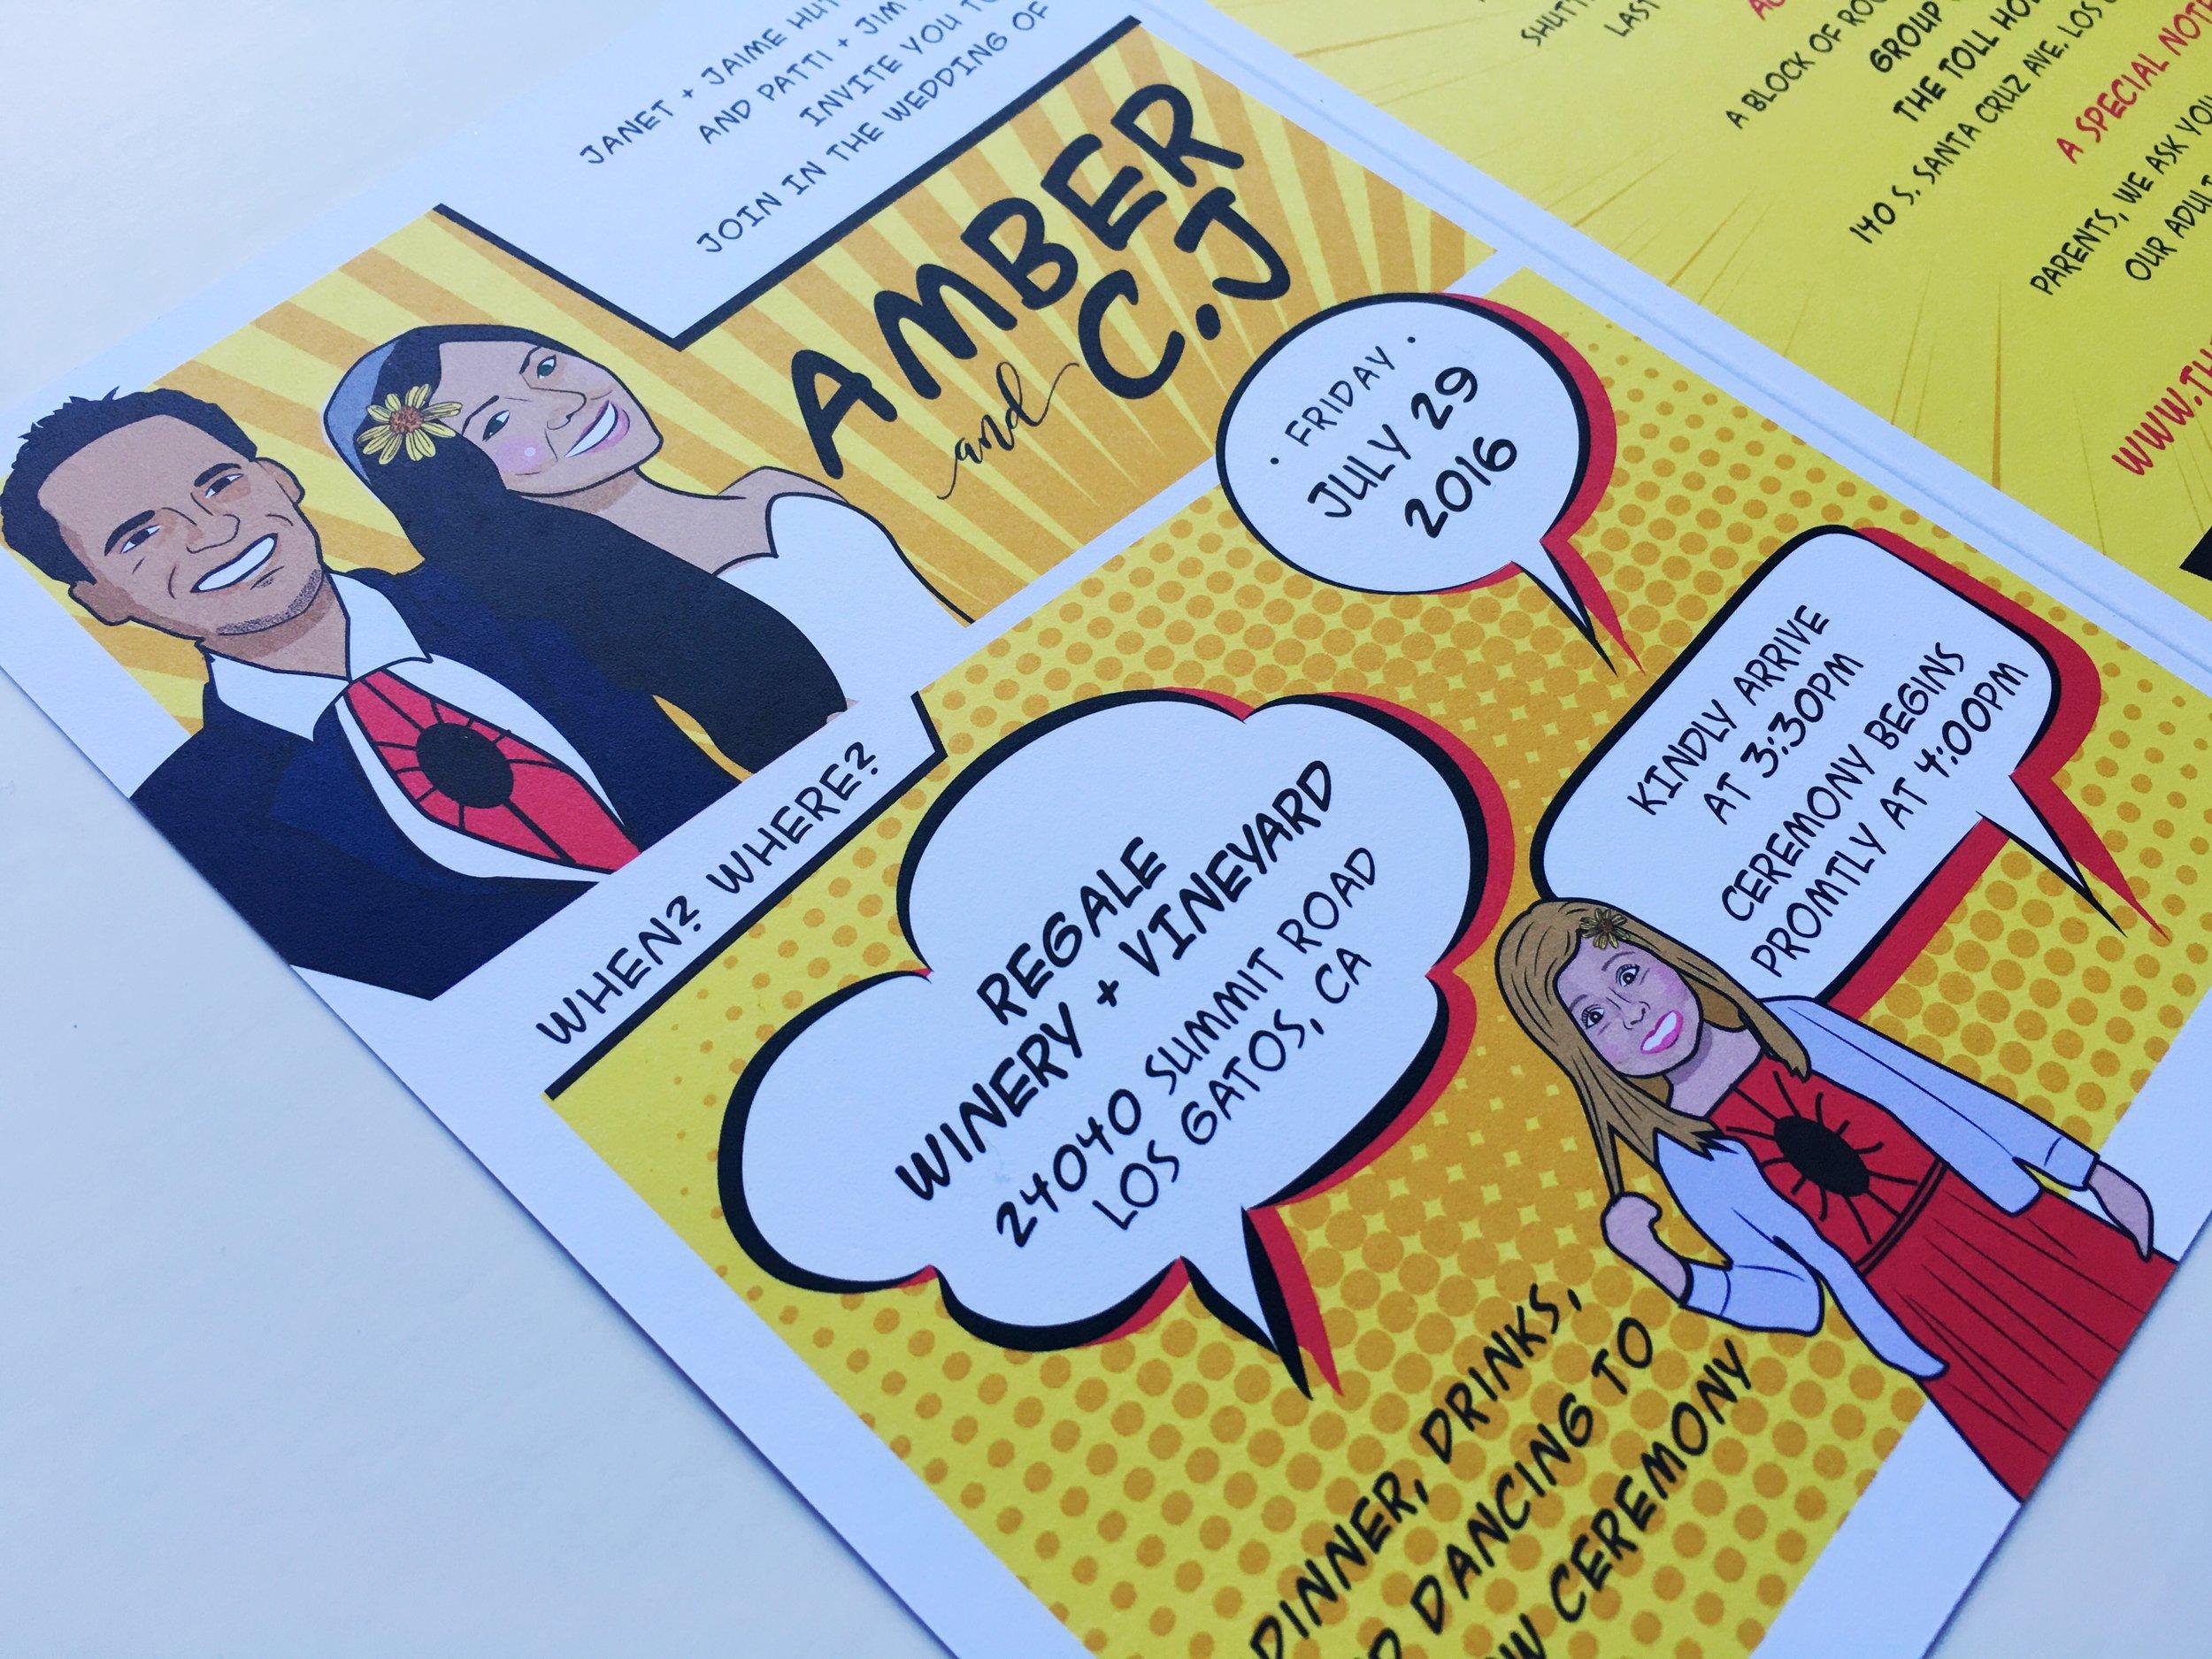 Amber and C.J Comic Book Wedding Invitation Details